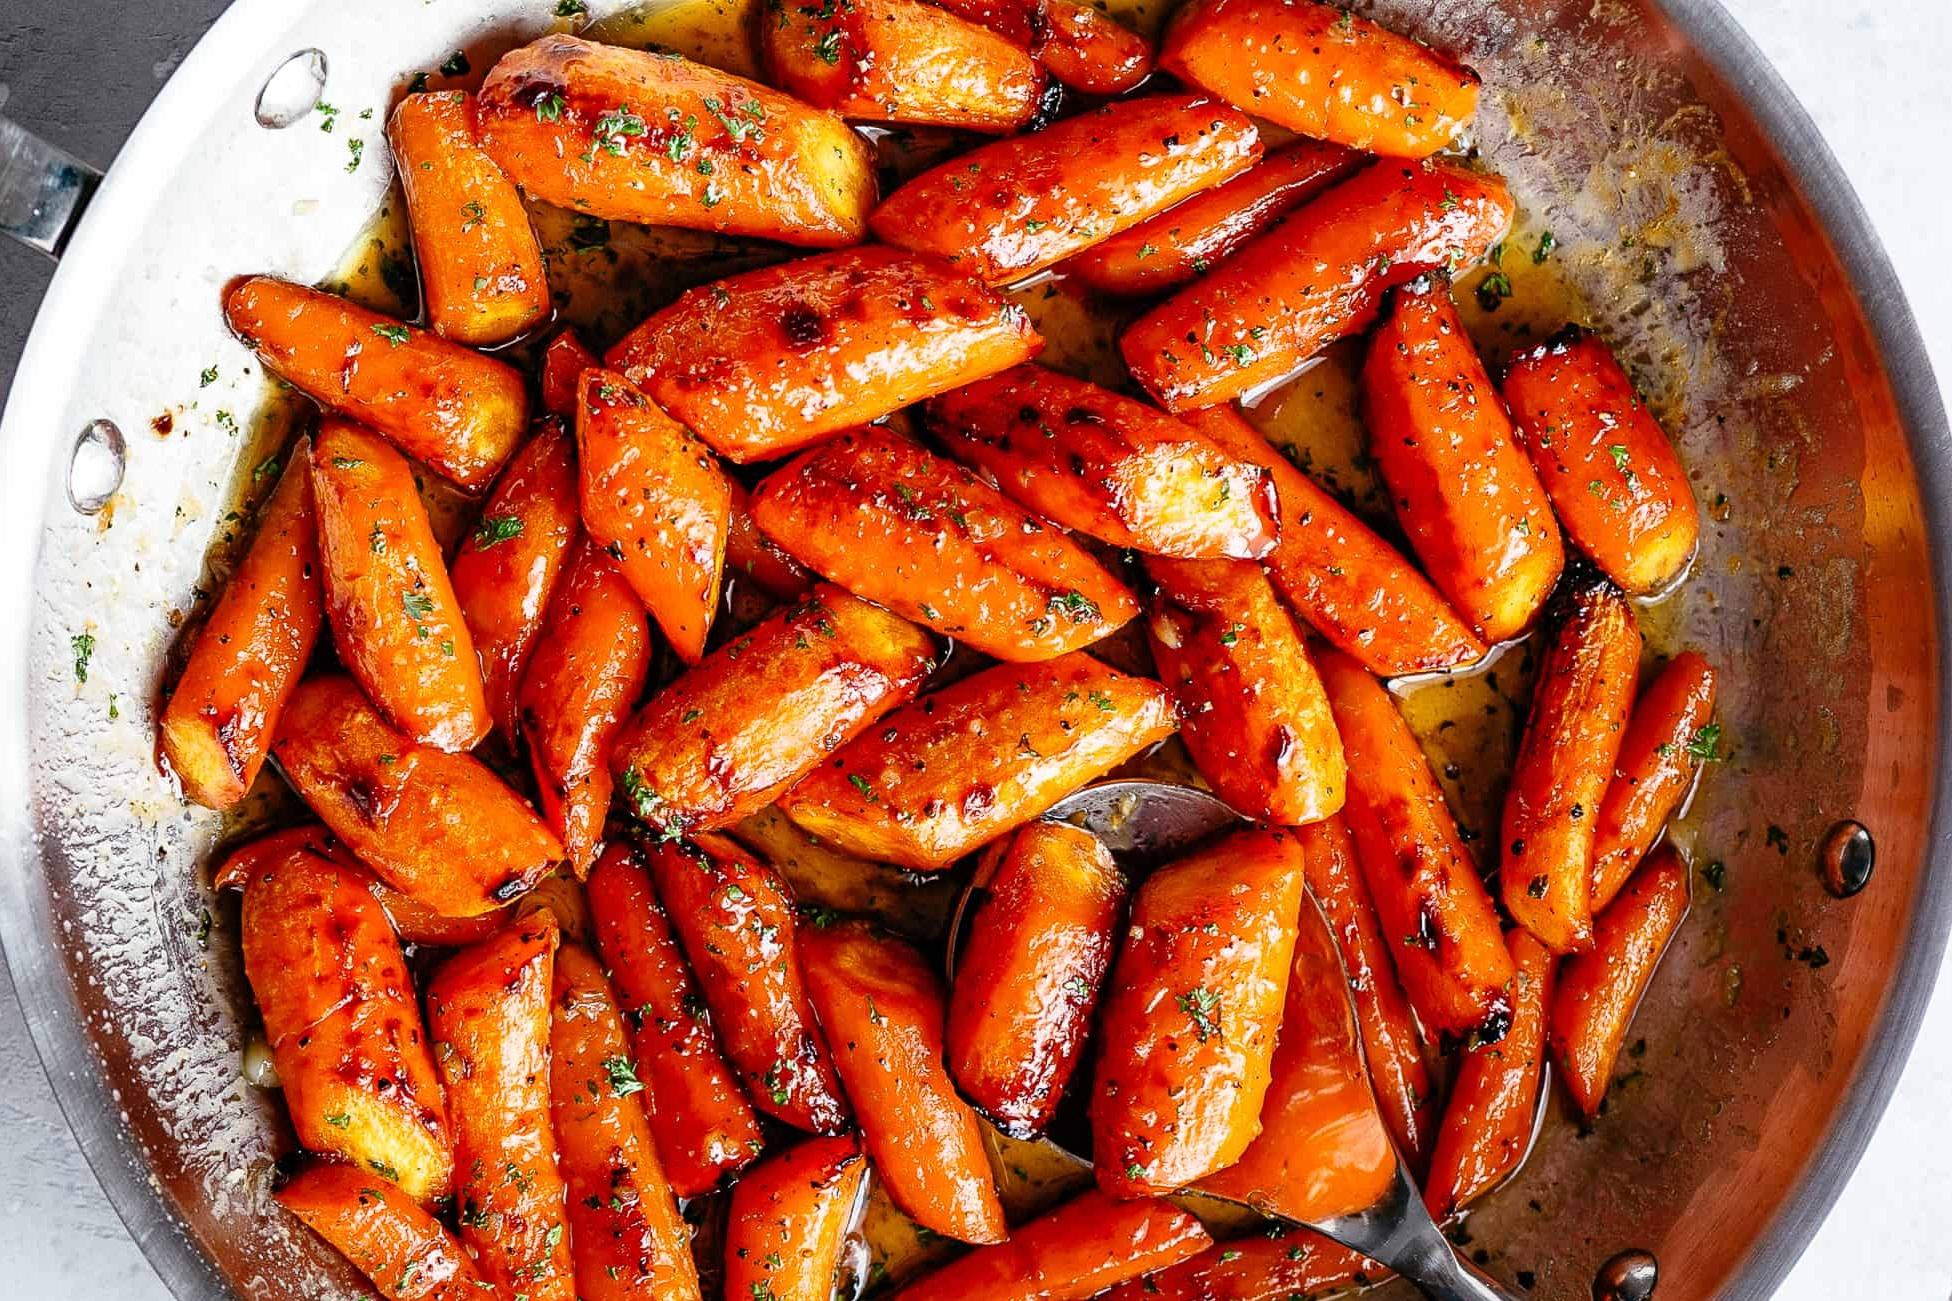 Honey-Garlic-Butter-Carrots-IMAGE-105.jpg